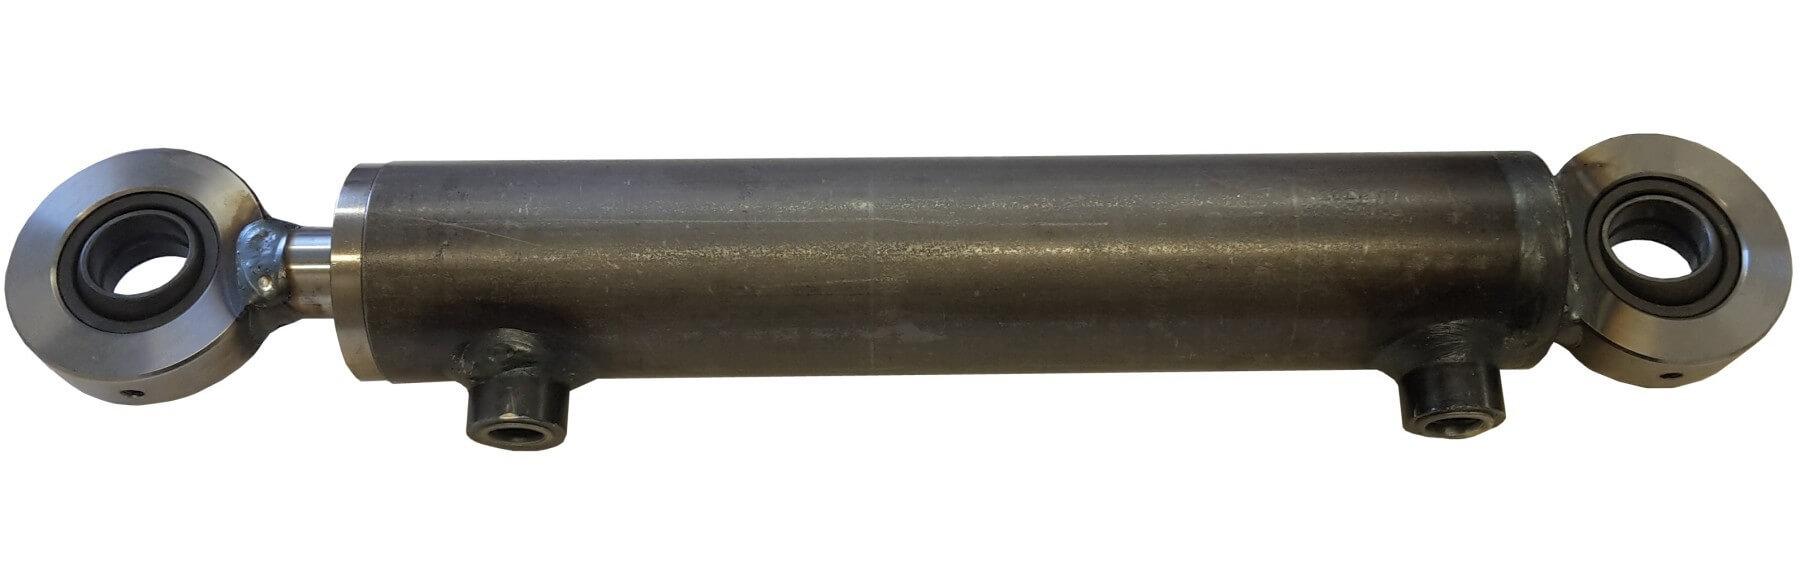 Hydraulisylinteri CL 50. 30. 800 GE